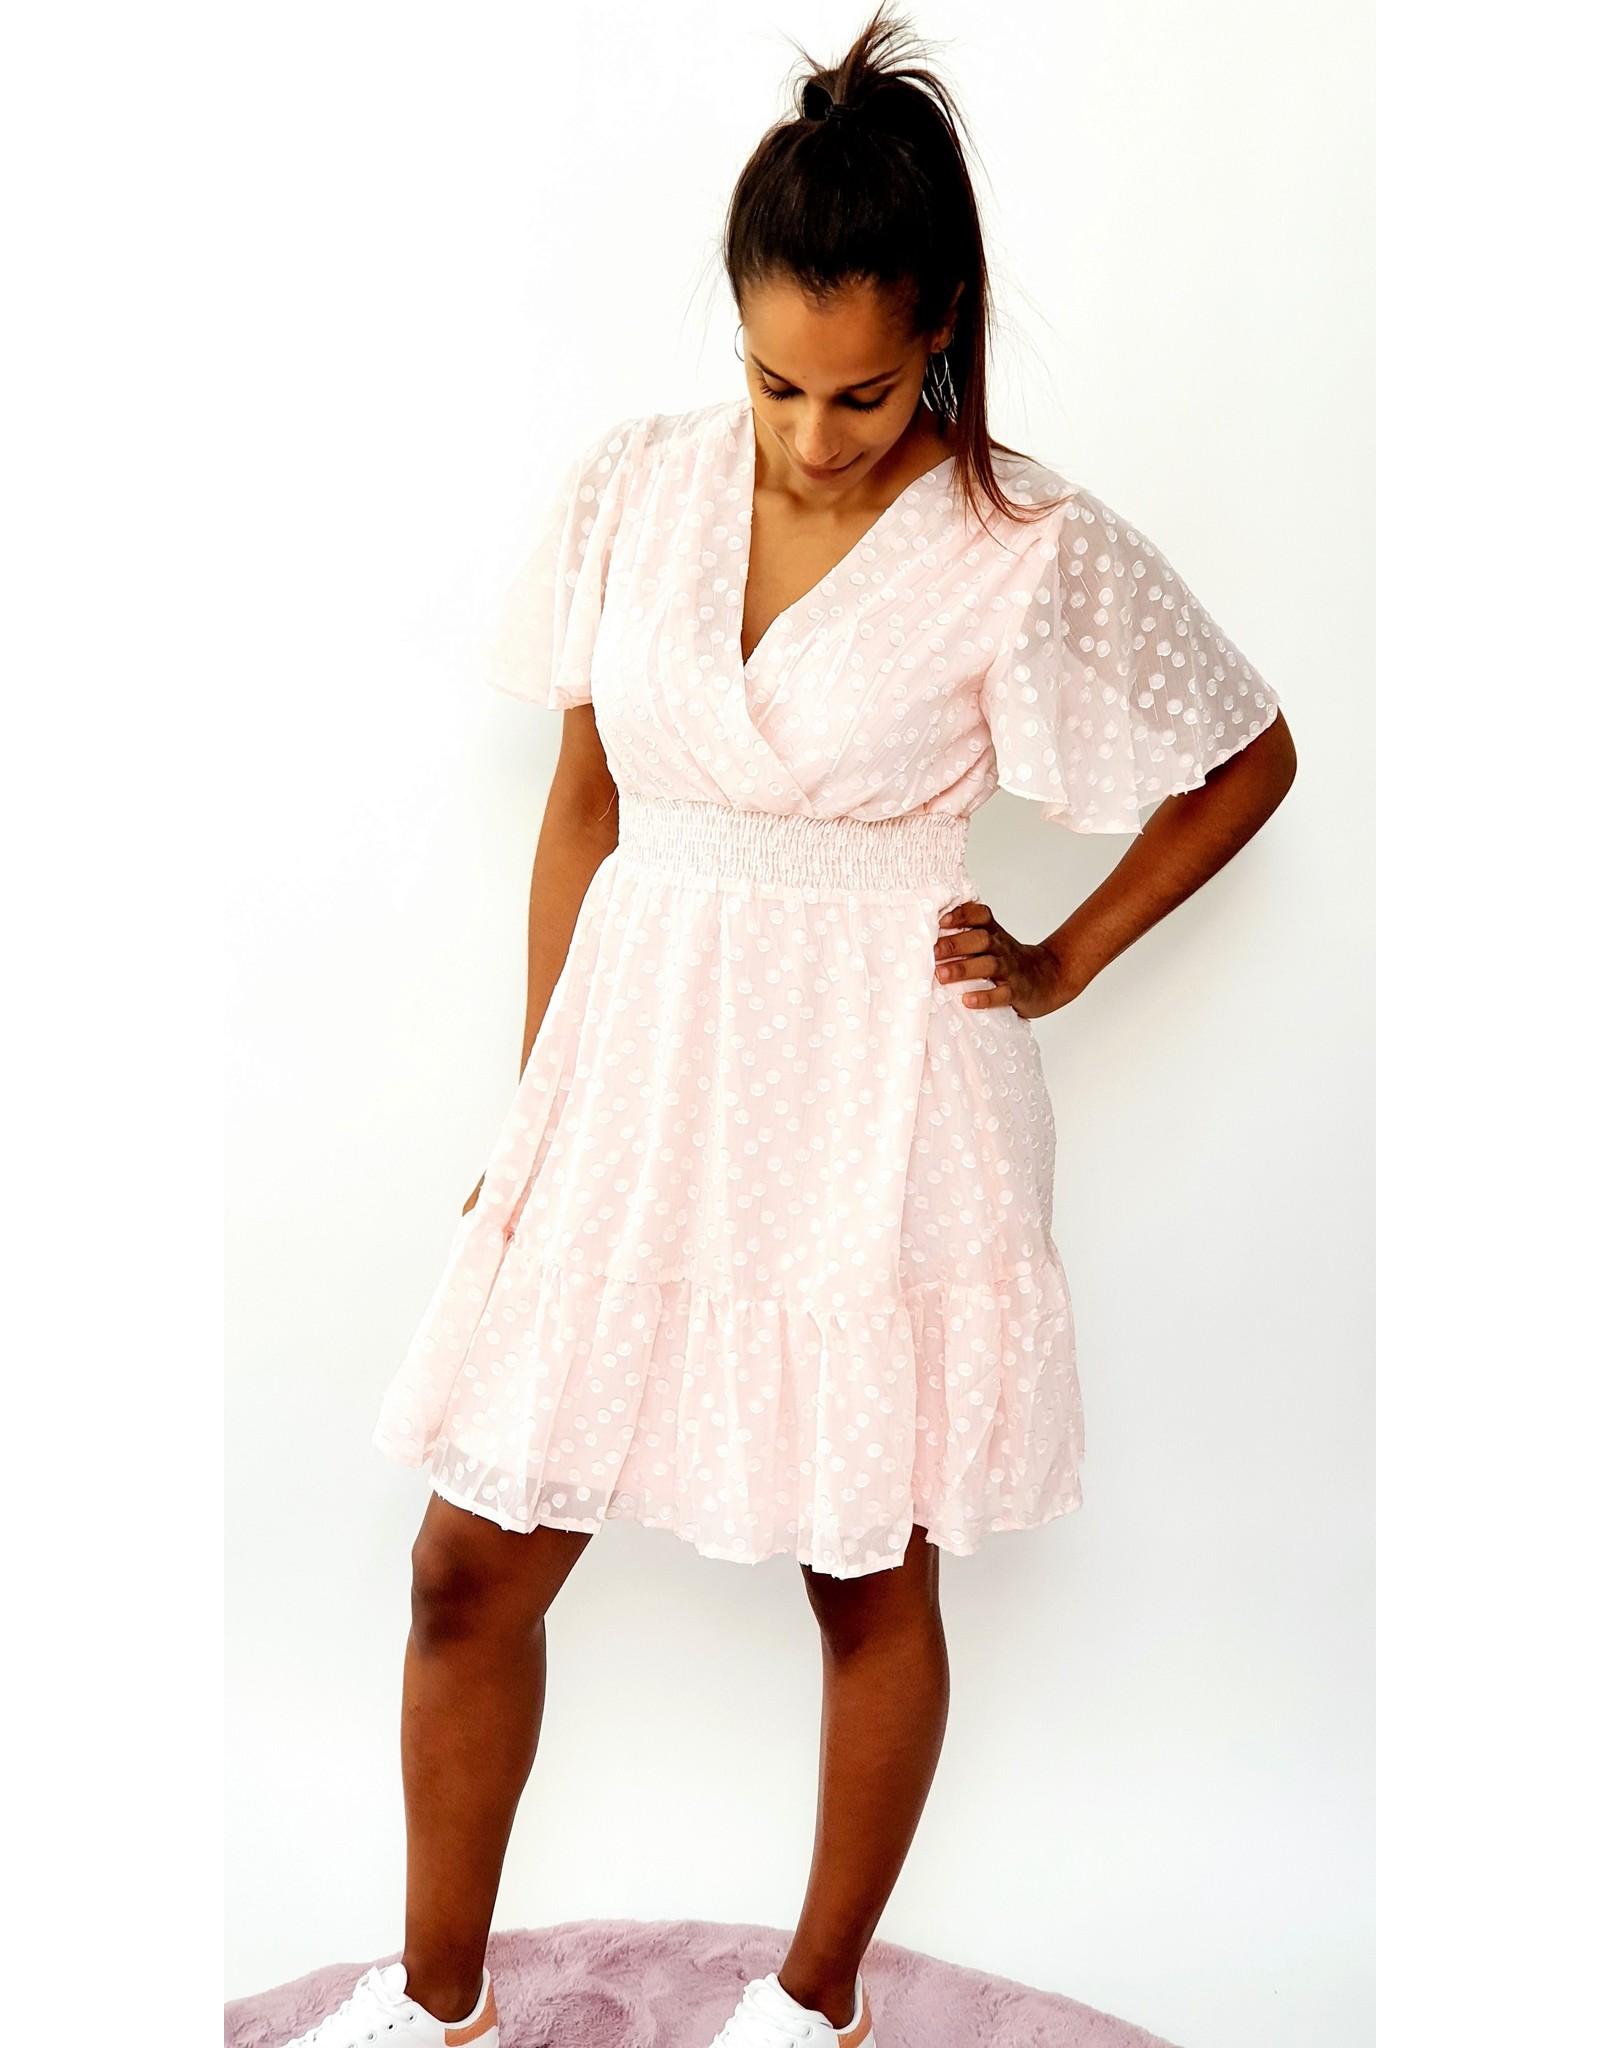 Thé pink dotty dress